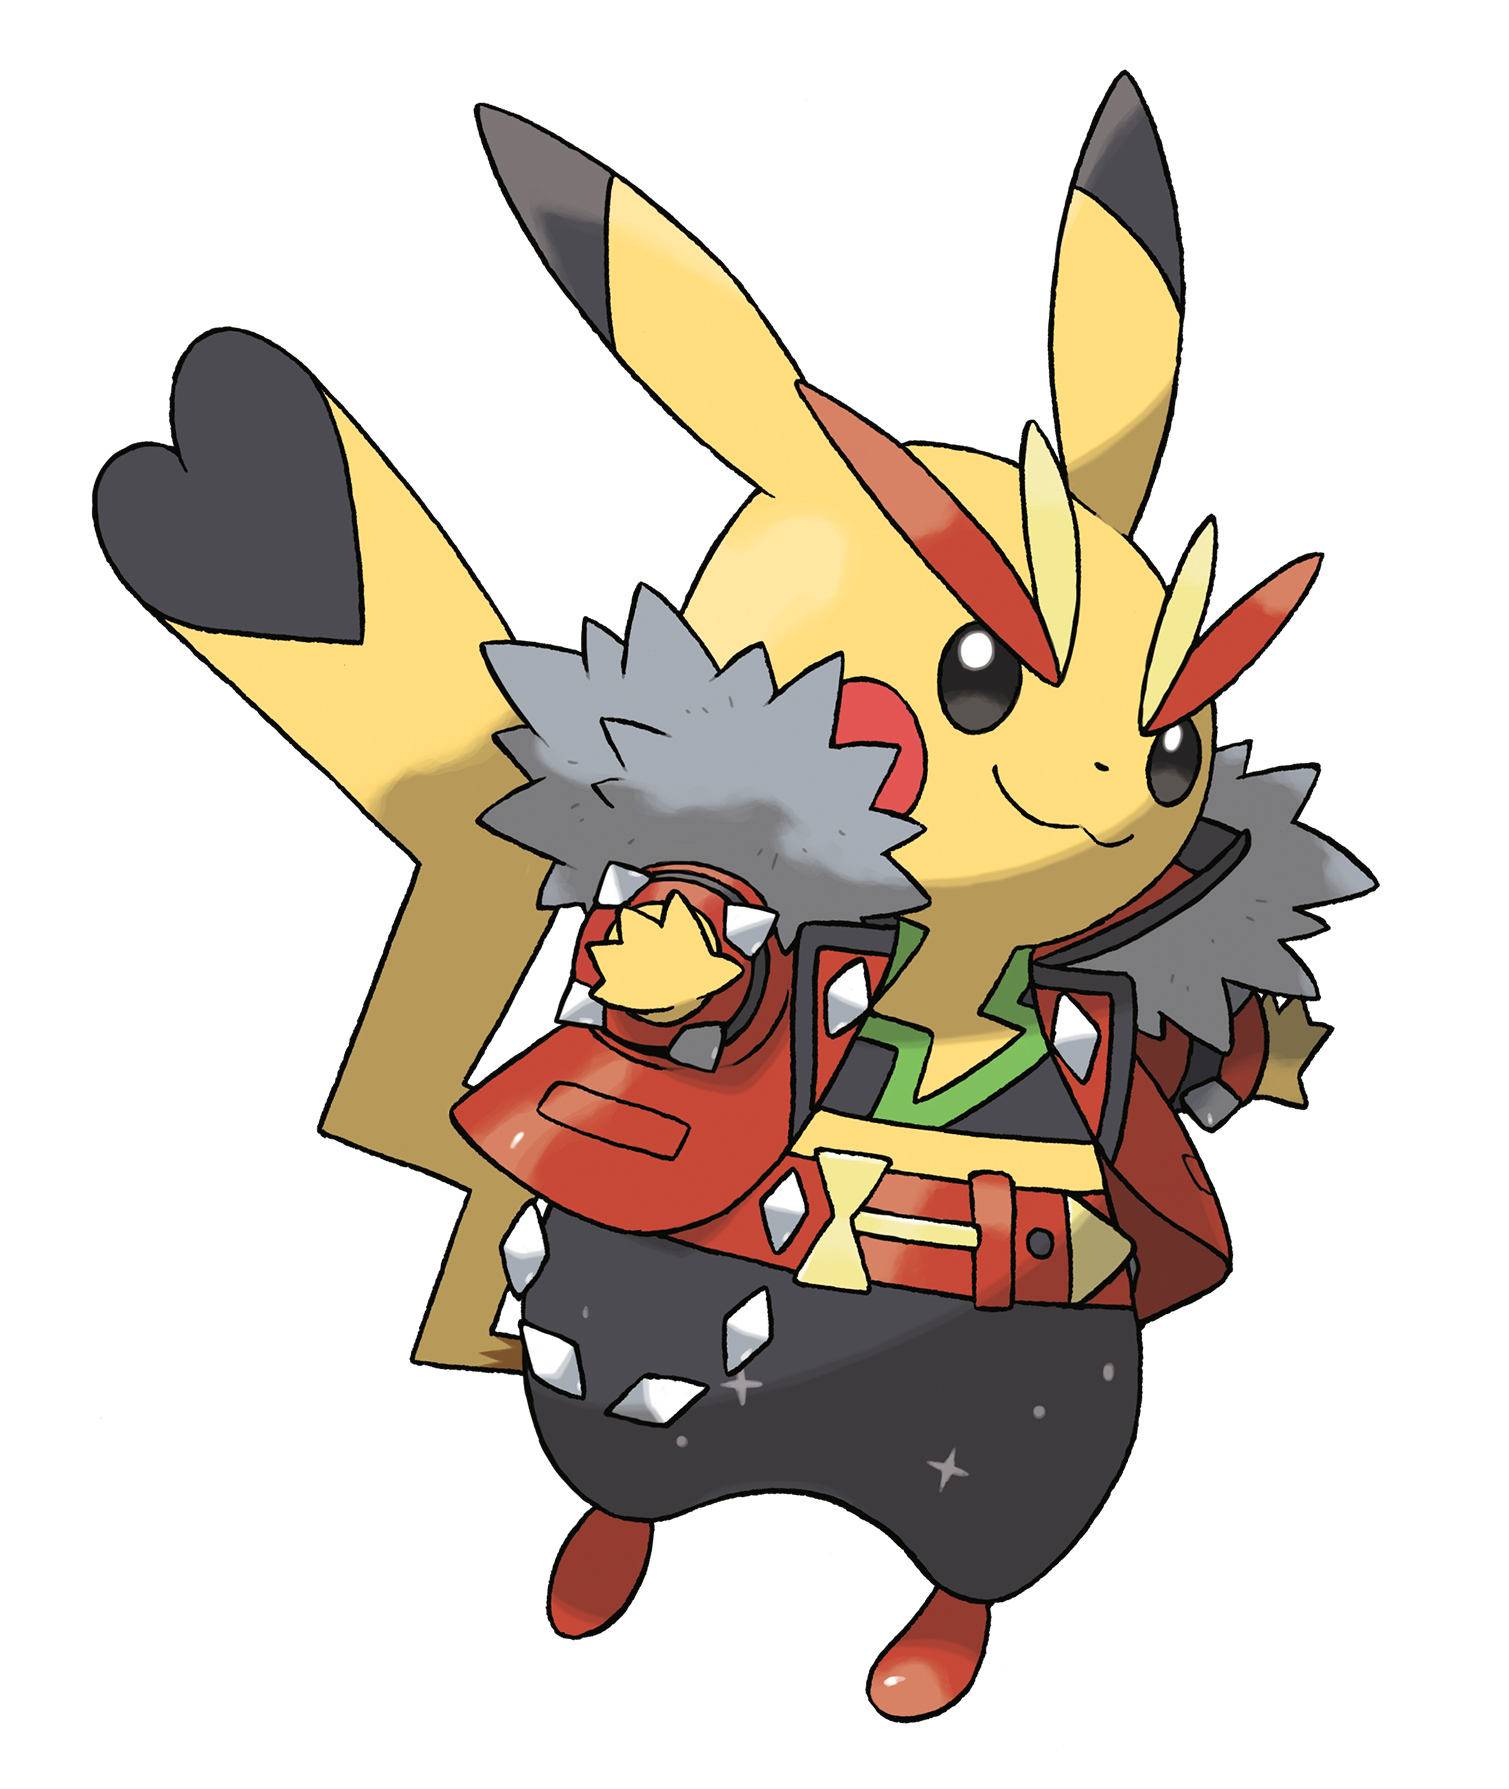 Pikachu mega evolutions